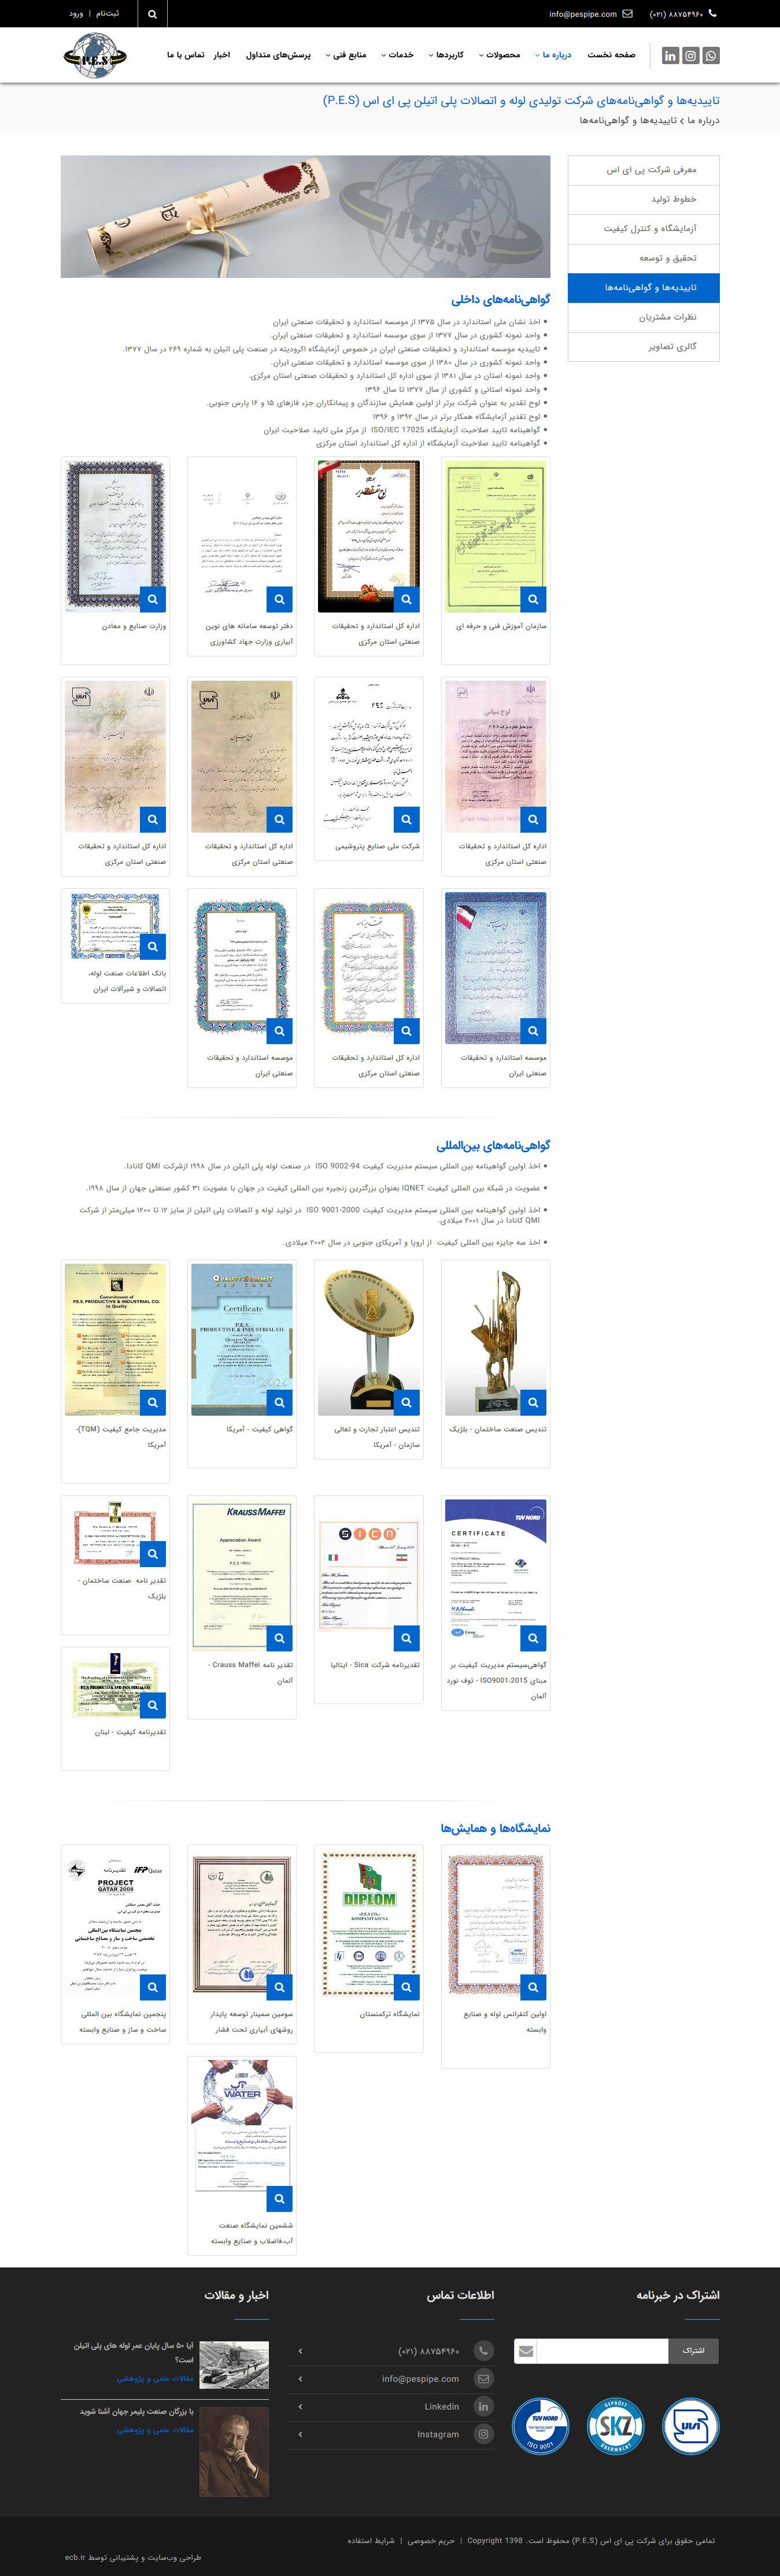 pespipe-com-fa-Certificates